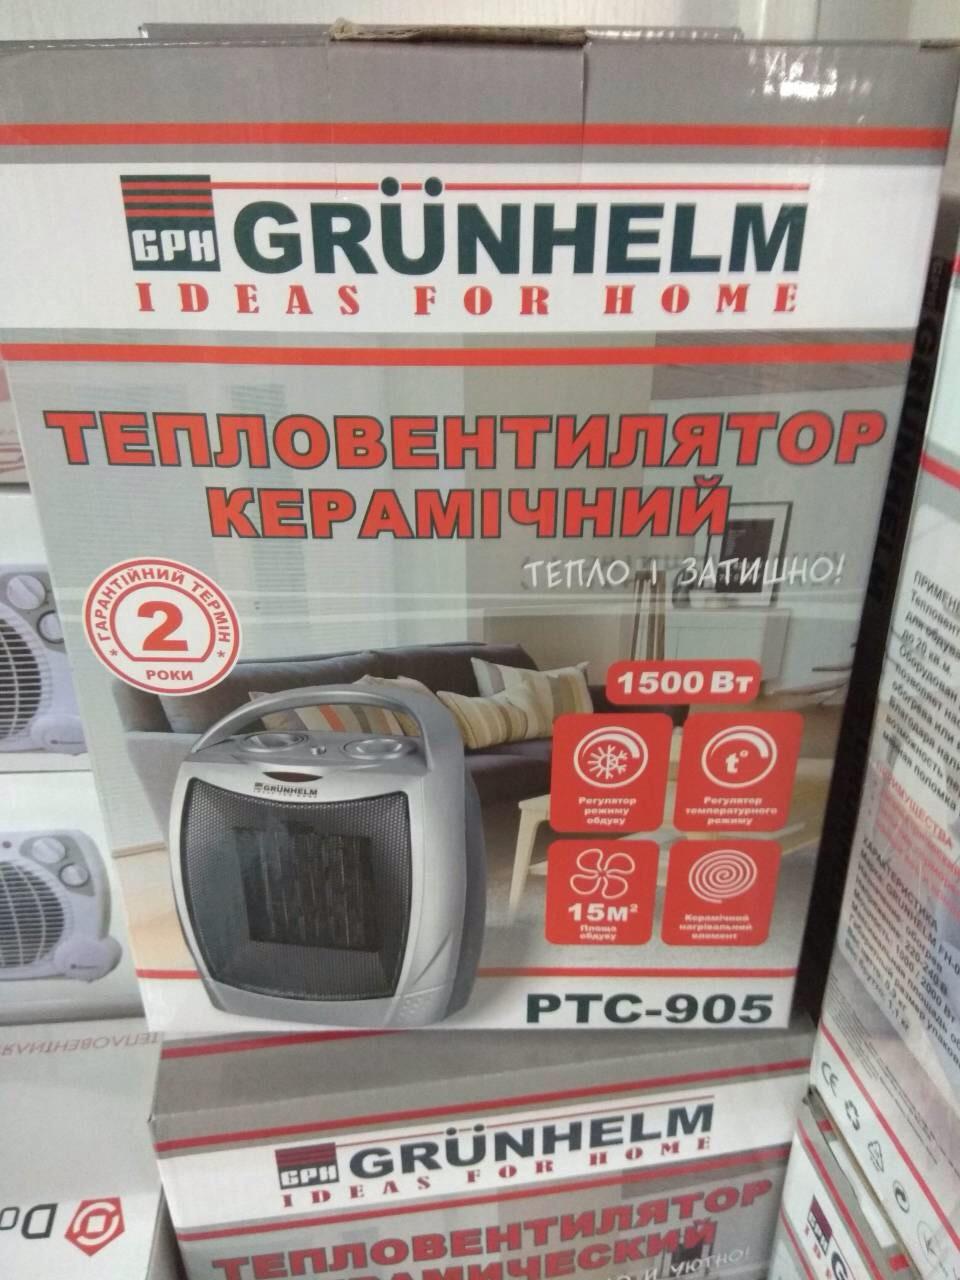 Тепловентилятор керамический GRUNHELM РТС-905